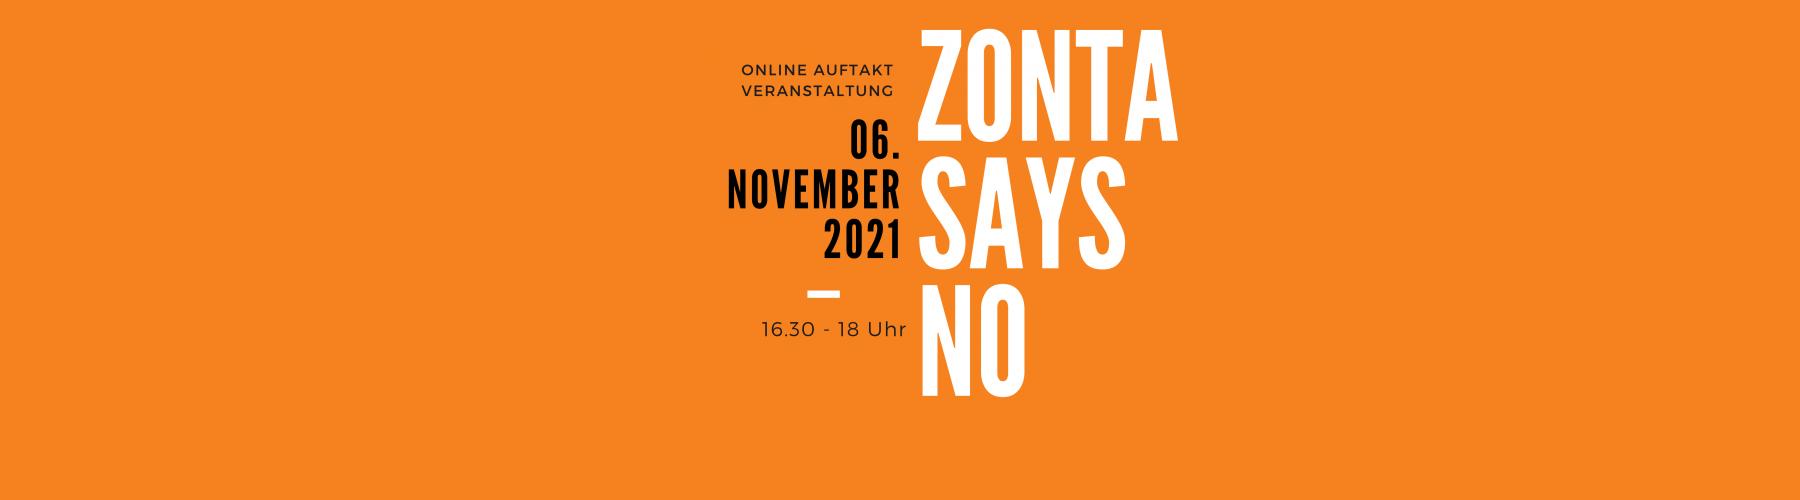 Zonta says NO 2021 Auftaktveranstaltung